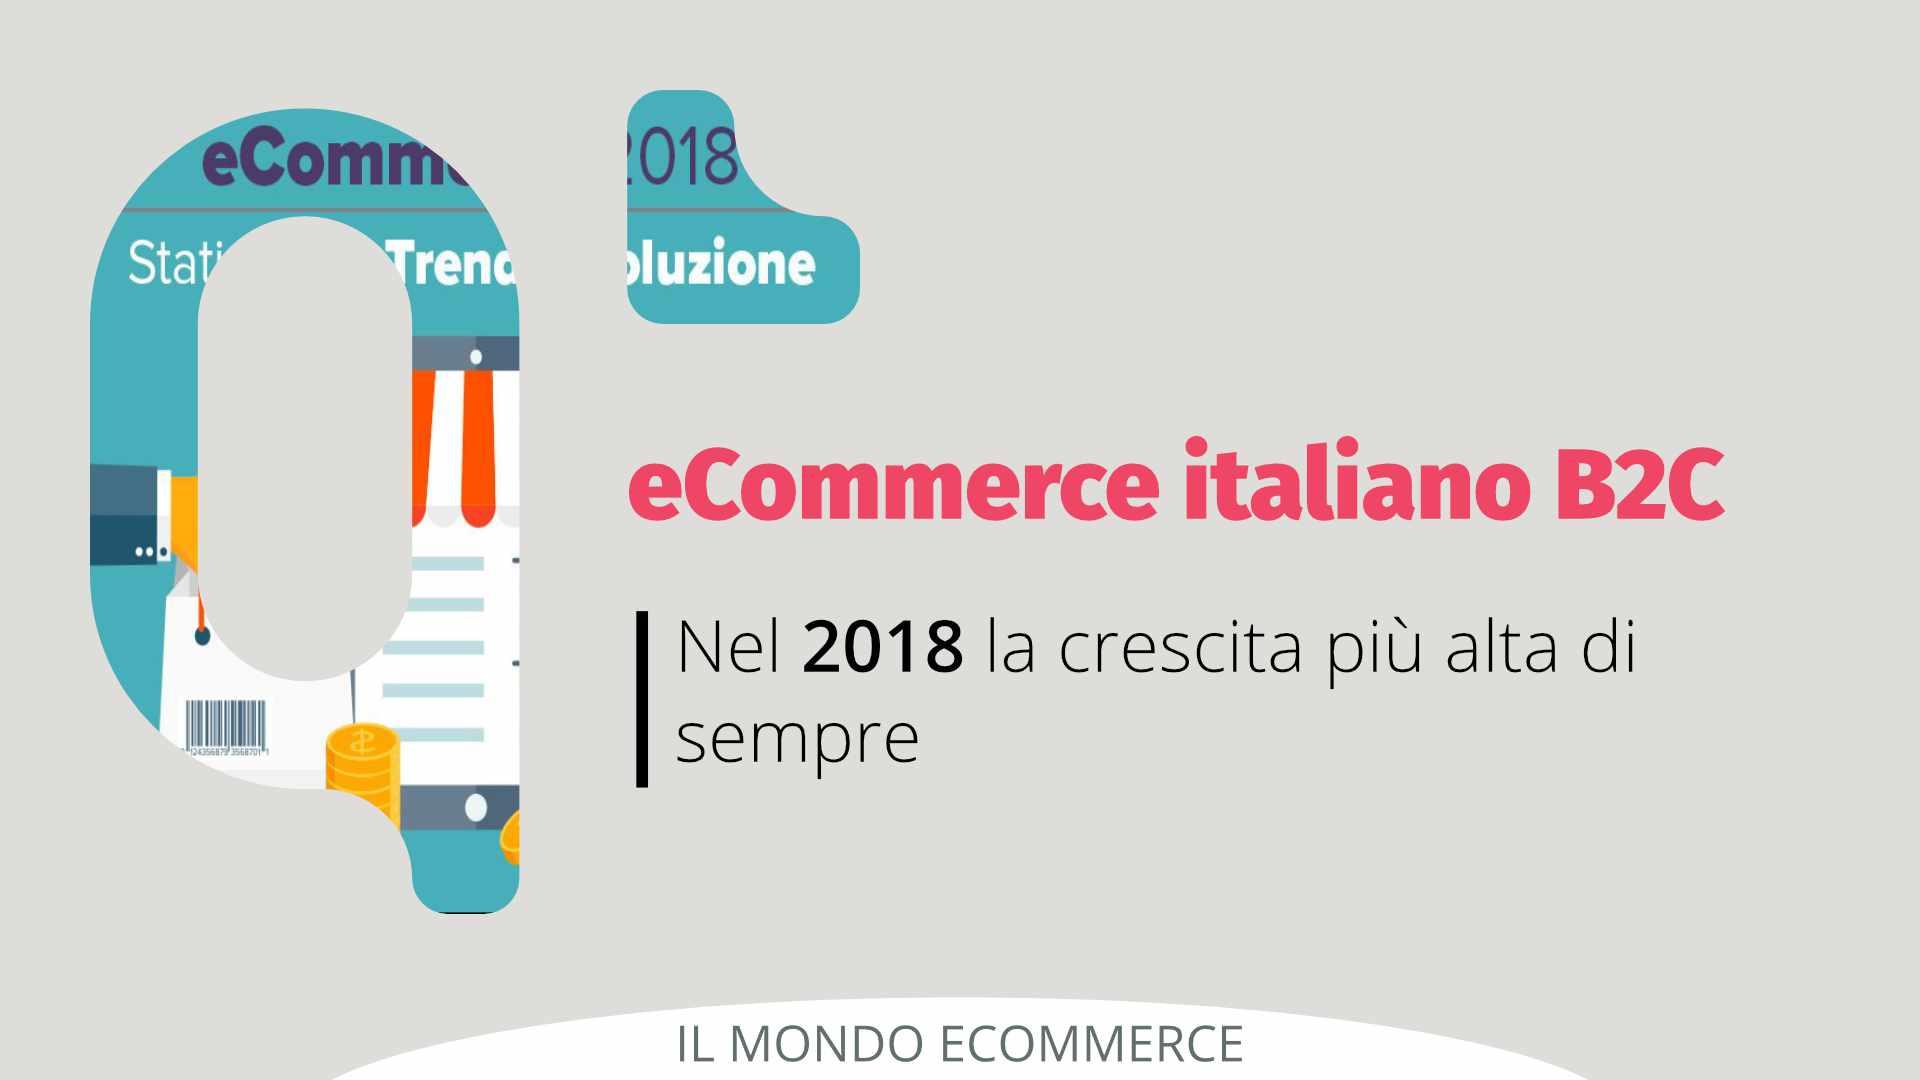 eCommerce 2018 crescita